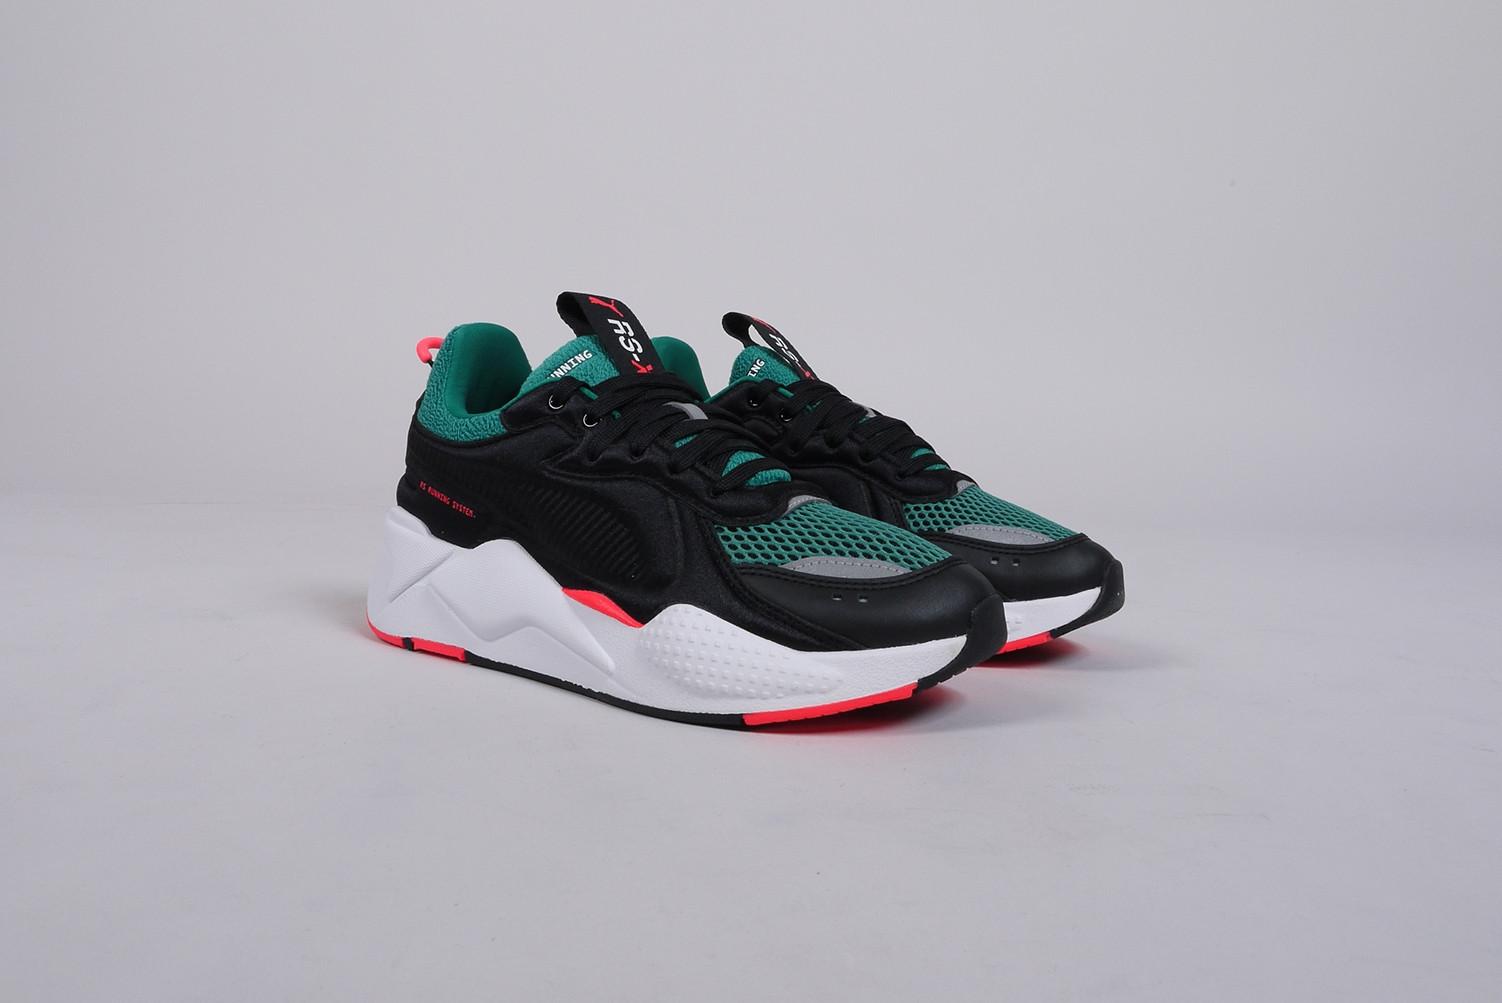 Damen puma Schwarz grün Rs x Soft C Ase Sneaker